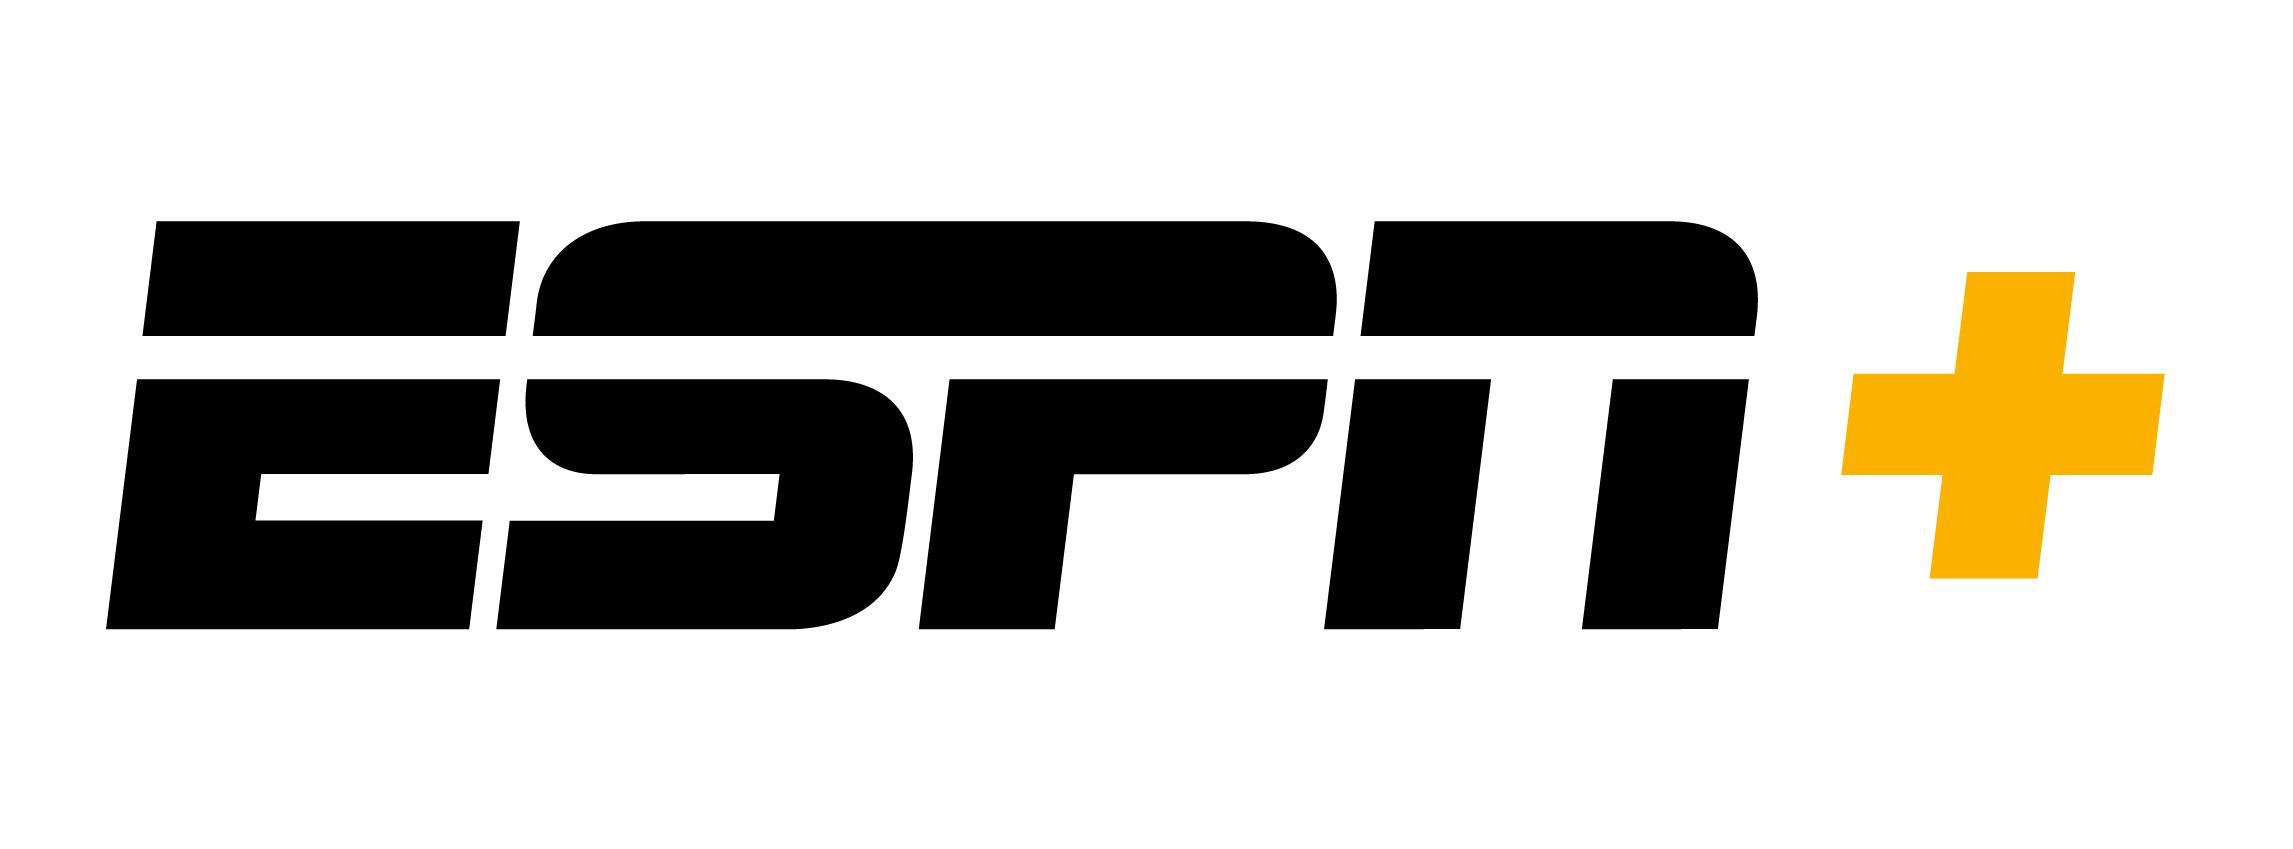 Espn Logo Logodix